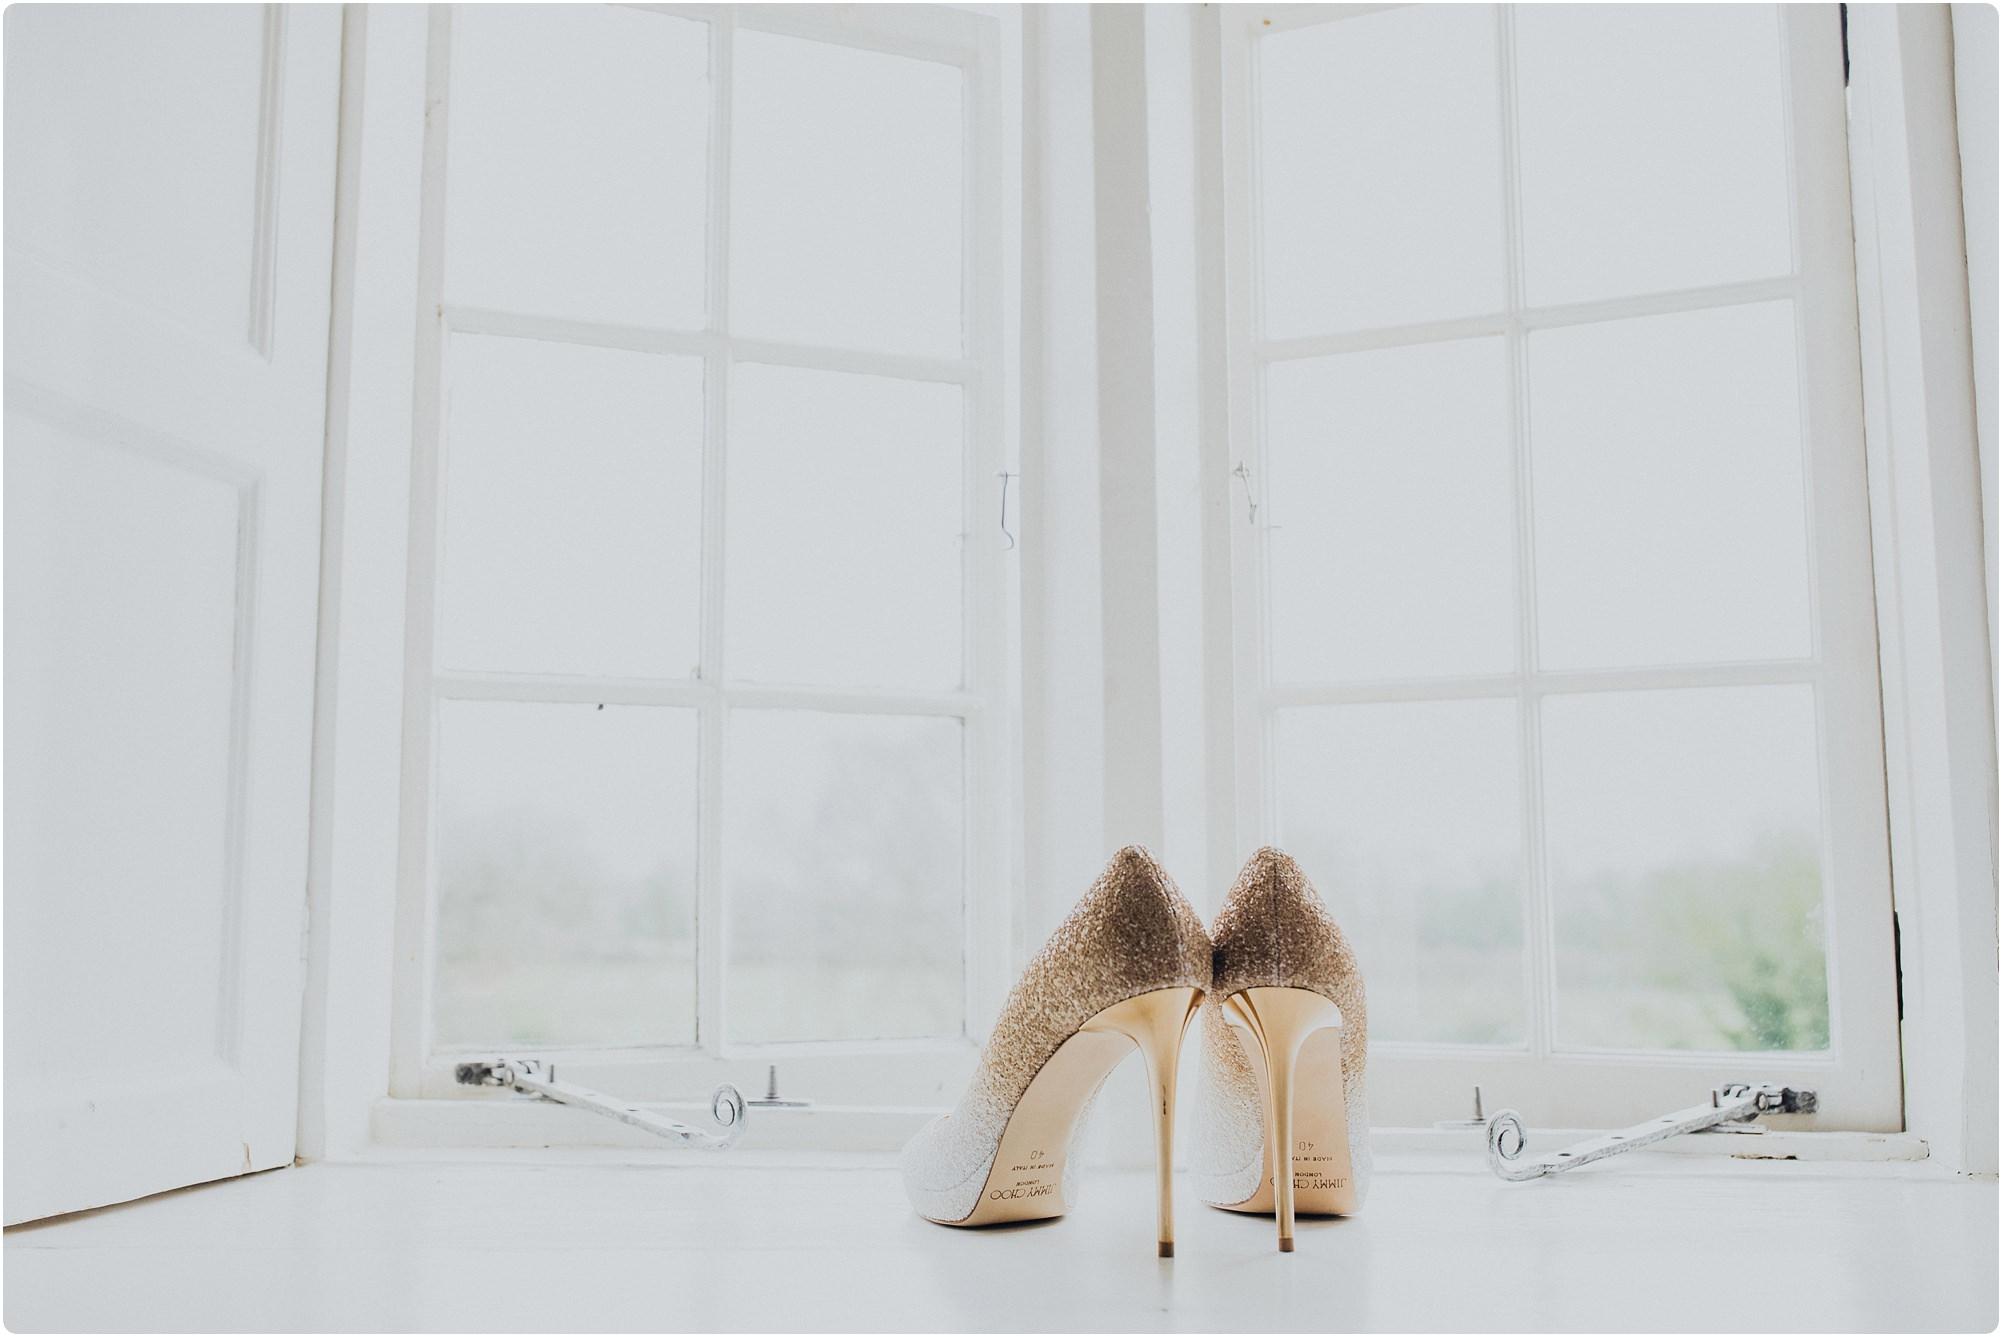 Gold heeled Jimmy Choos